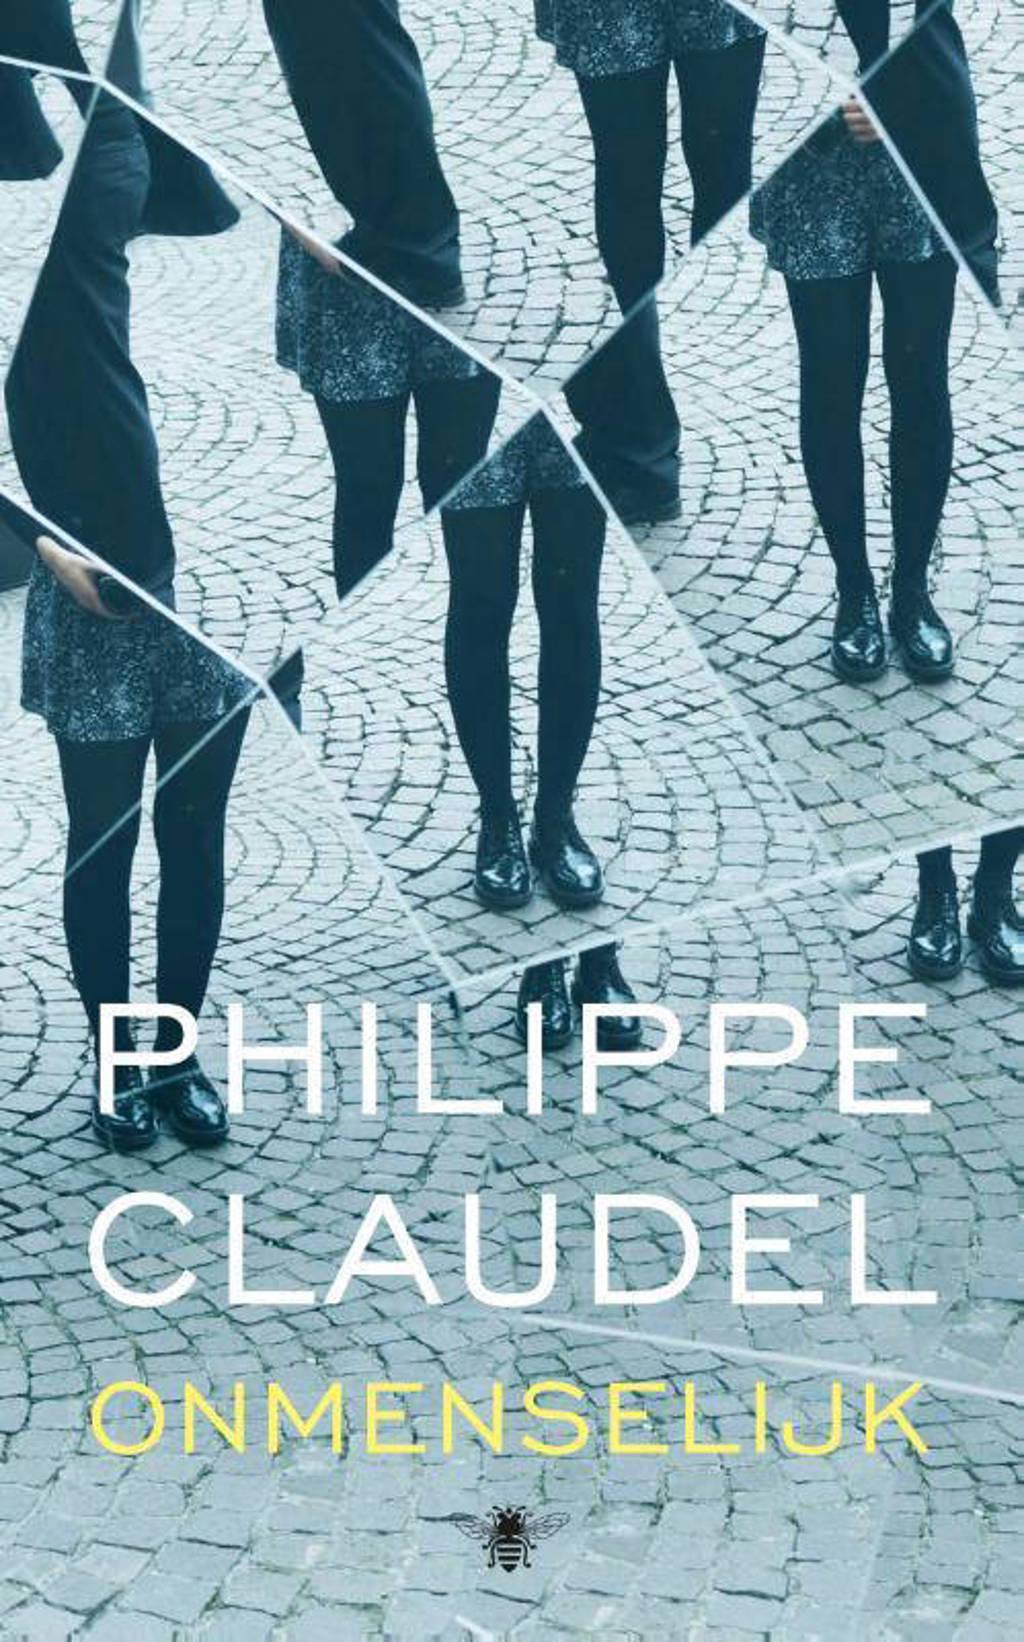 Onmenselijk - Philippe Claudel